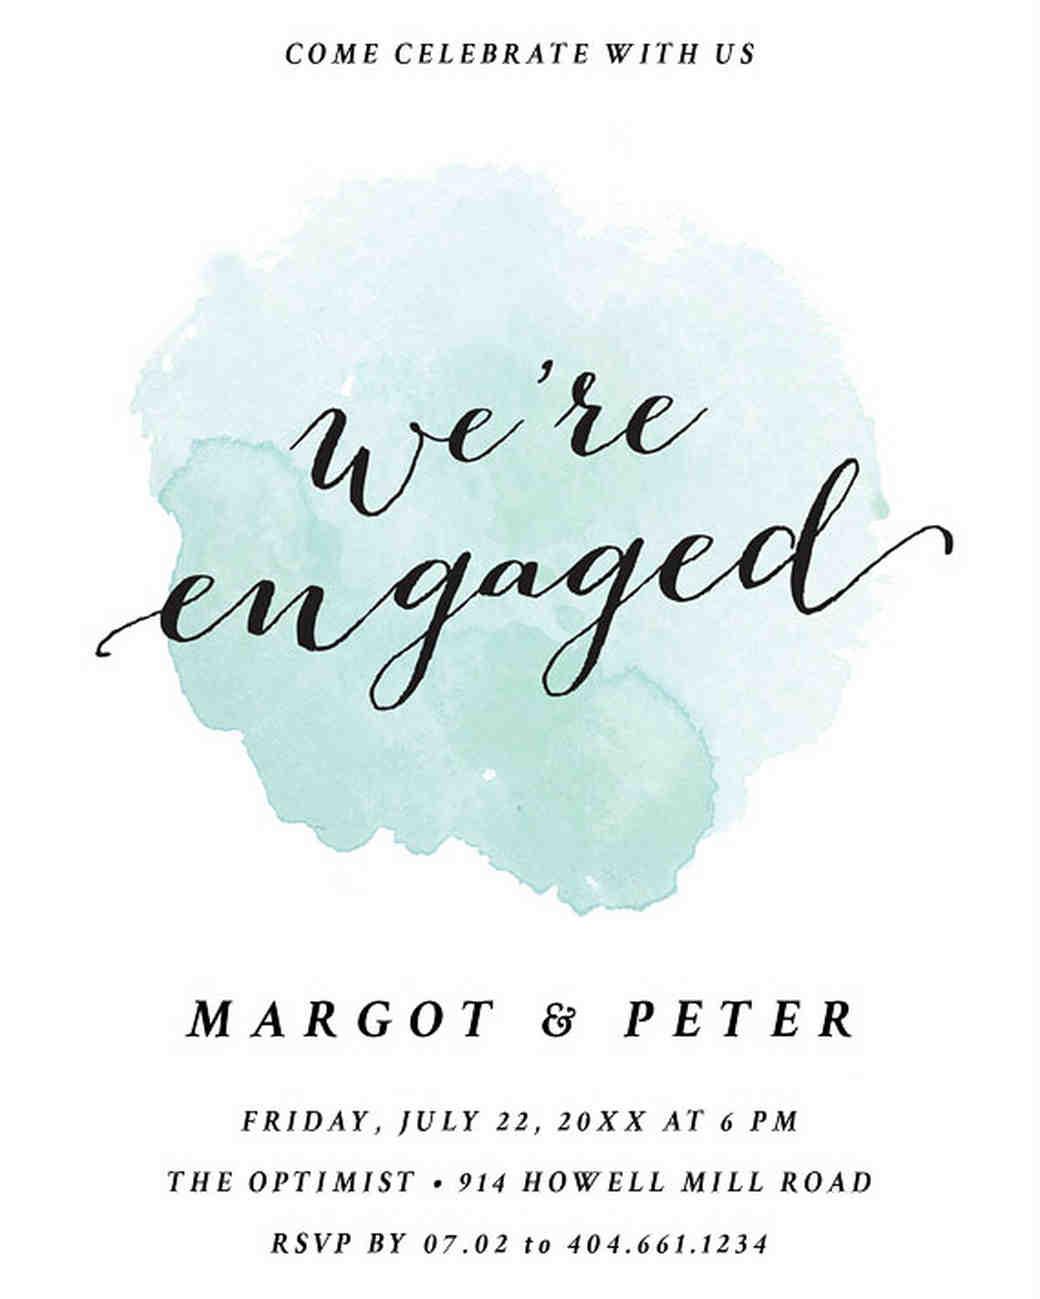 paperless-engagement-party-invitations-greenvelope-watercolor-emblem-0416.jpg